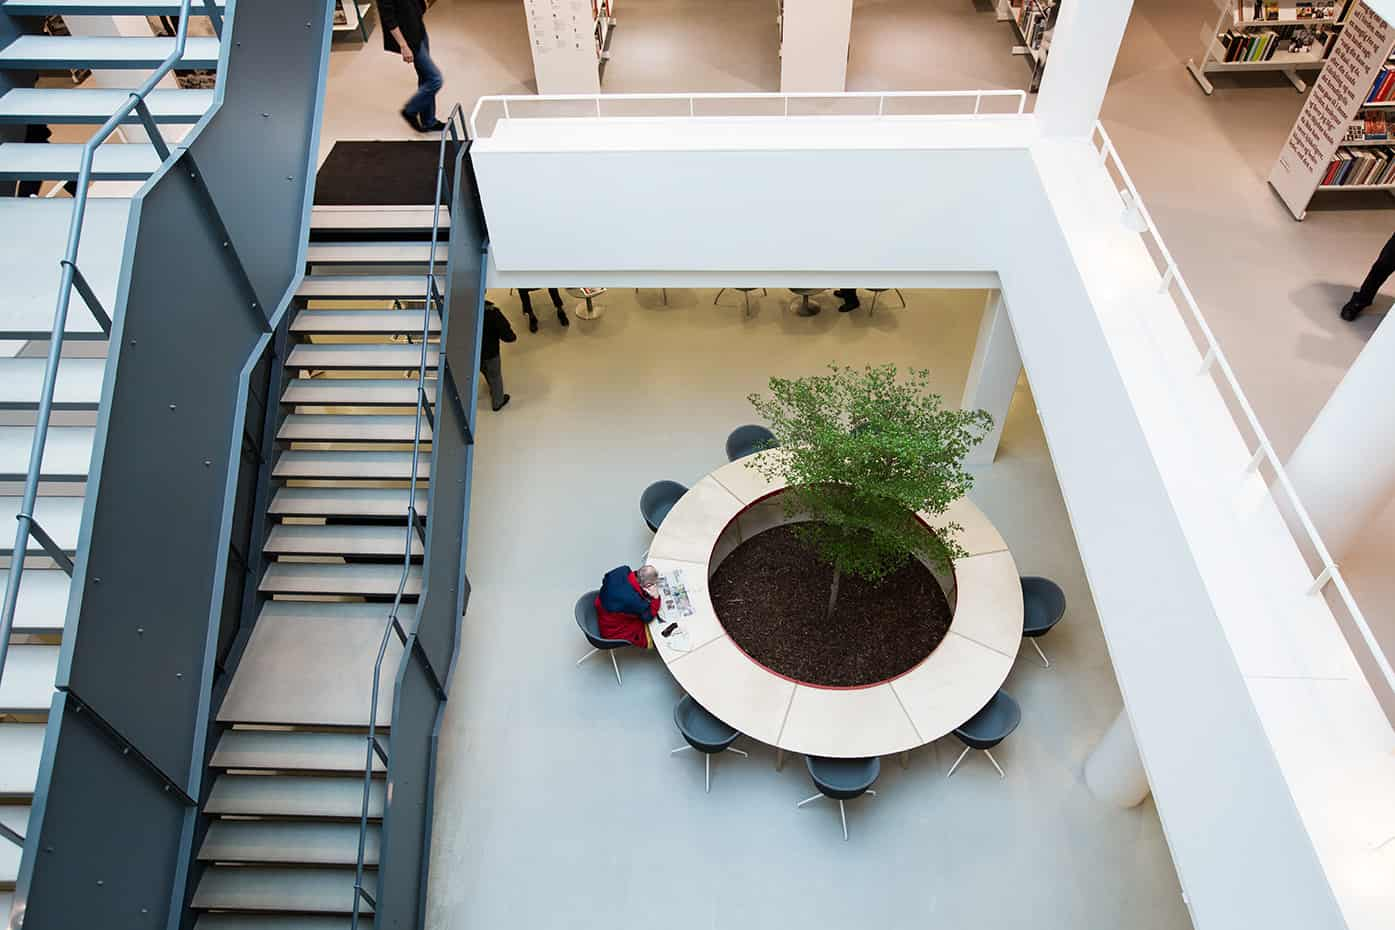 RITAarch, Indretning, spaceplanning, biblioteksdesign, biblioteksindretning, wayfinding, grafik, spaceplanning, arkitektur, atrium, læseområde, Holbæk bibliotek